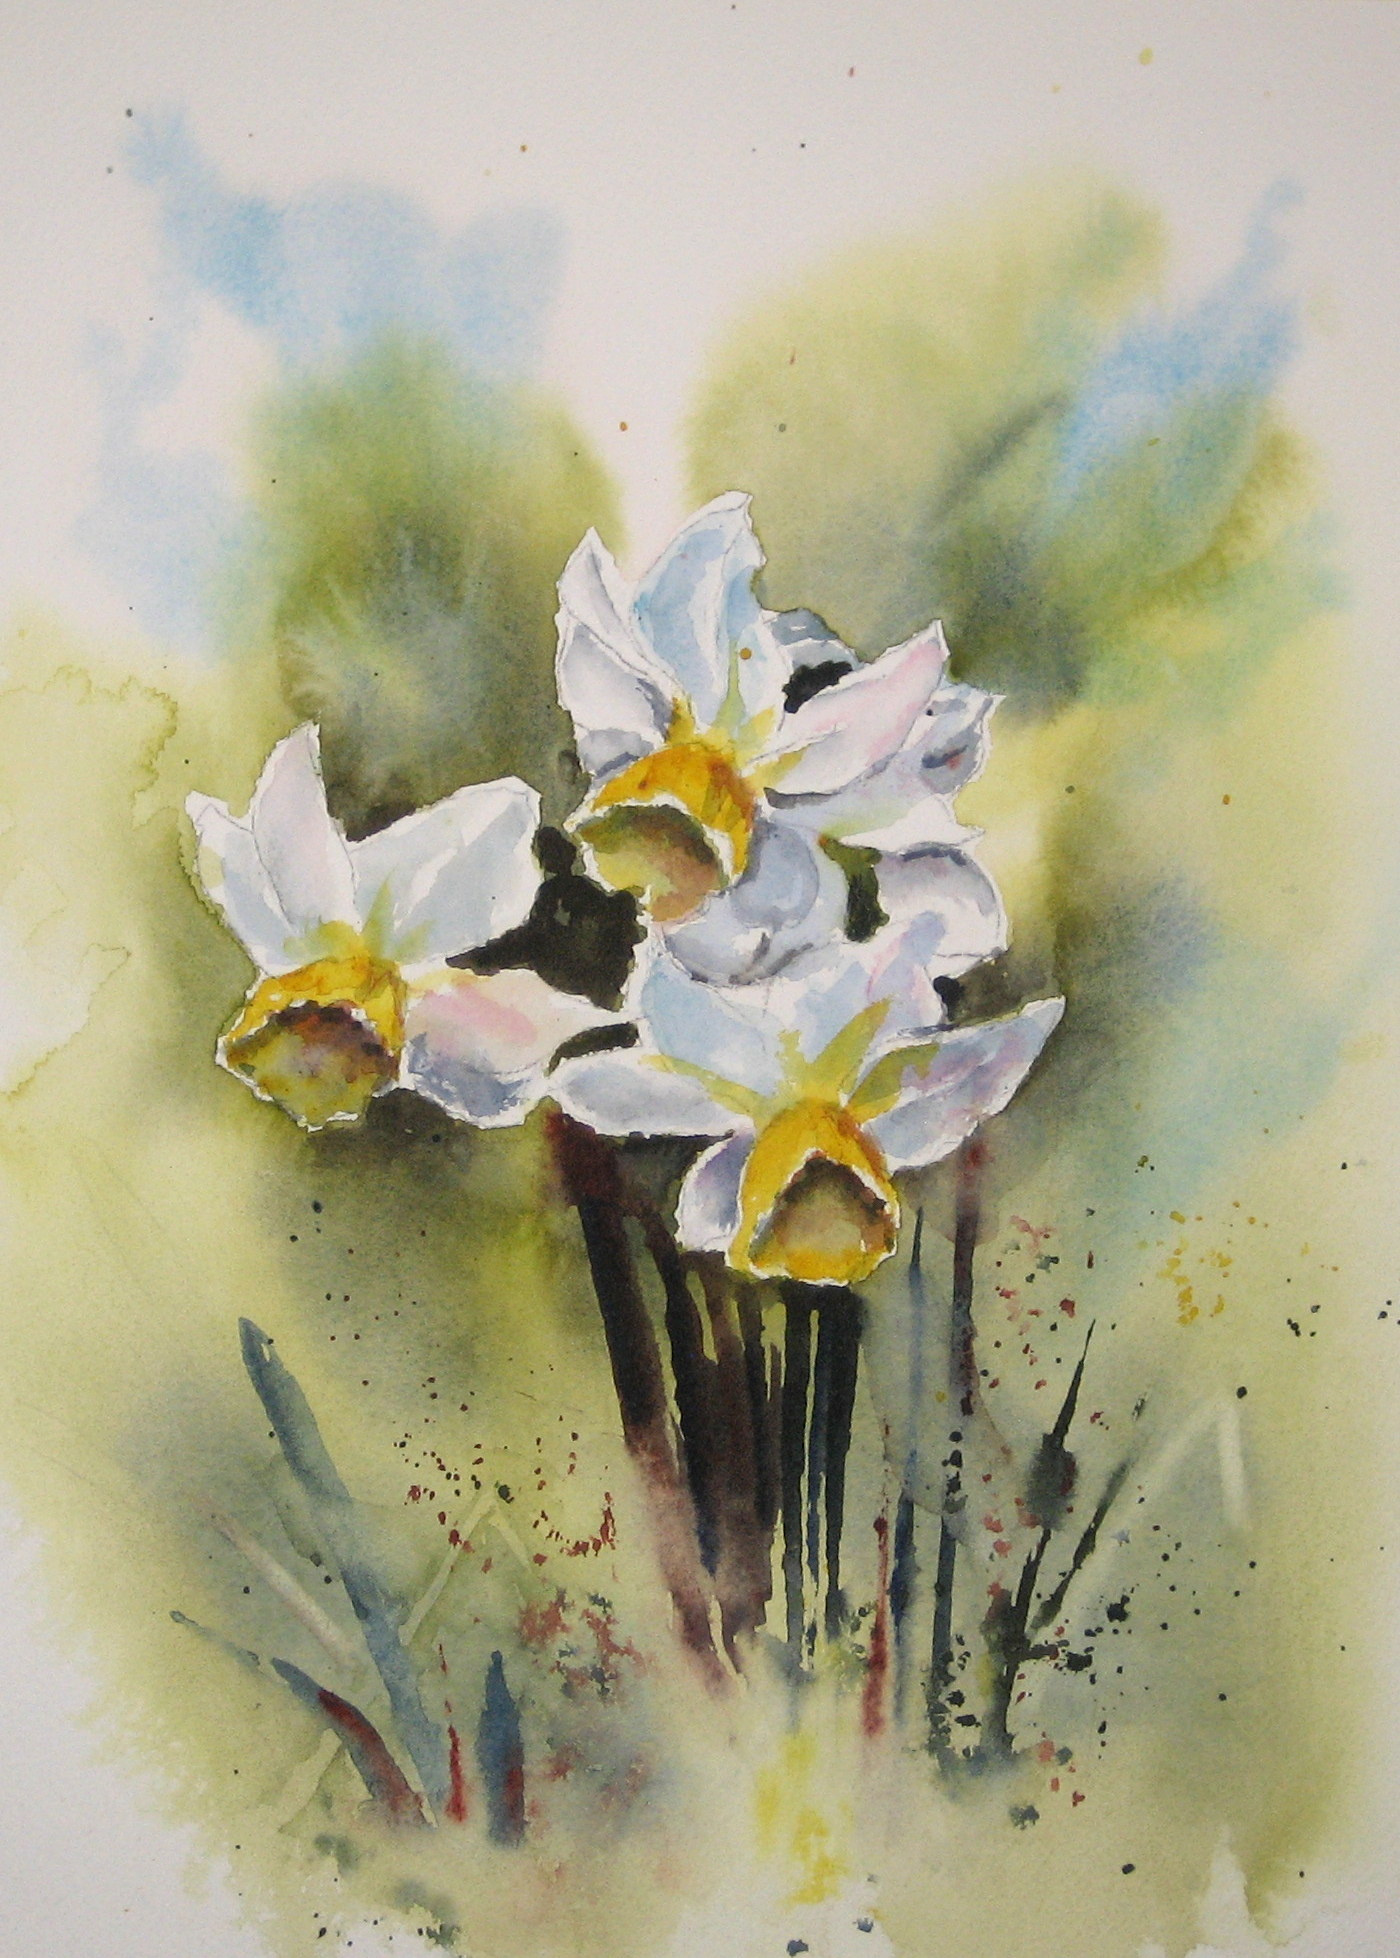 https://0201.nccdn.net/1_2/000/000/114/837/daffodils-1400x1958.jpg